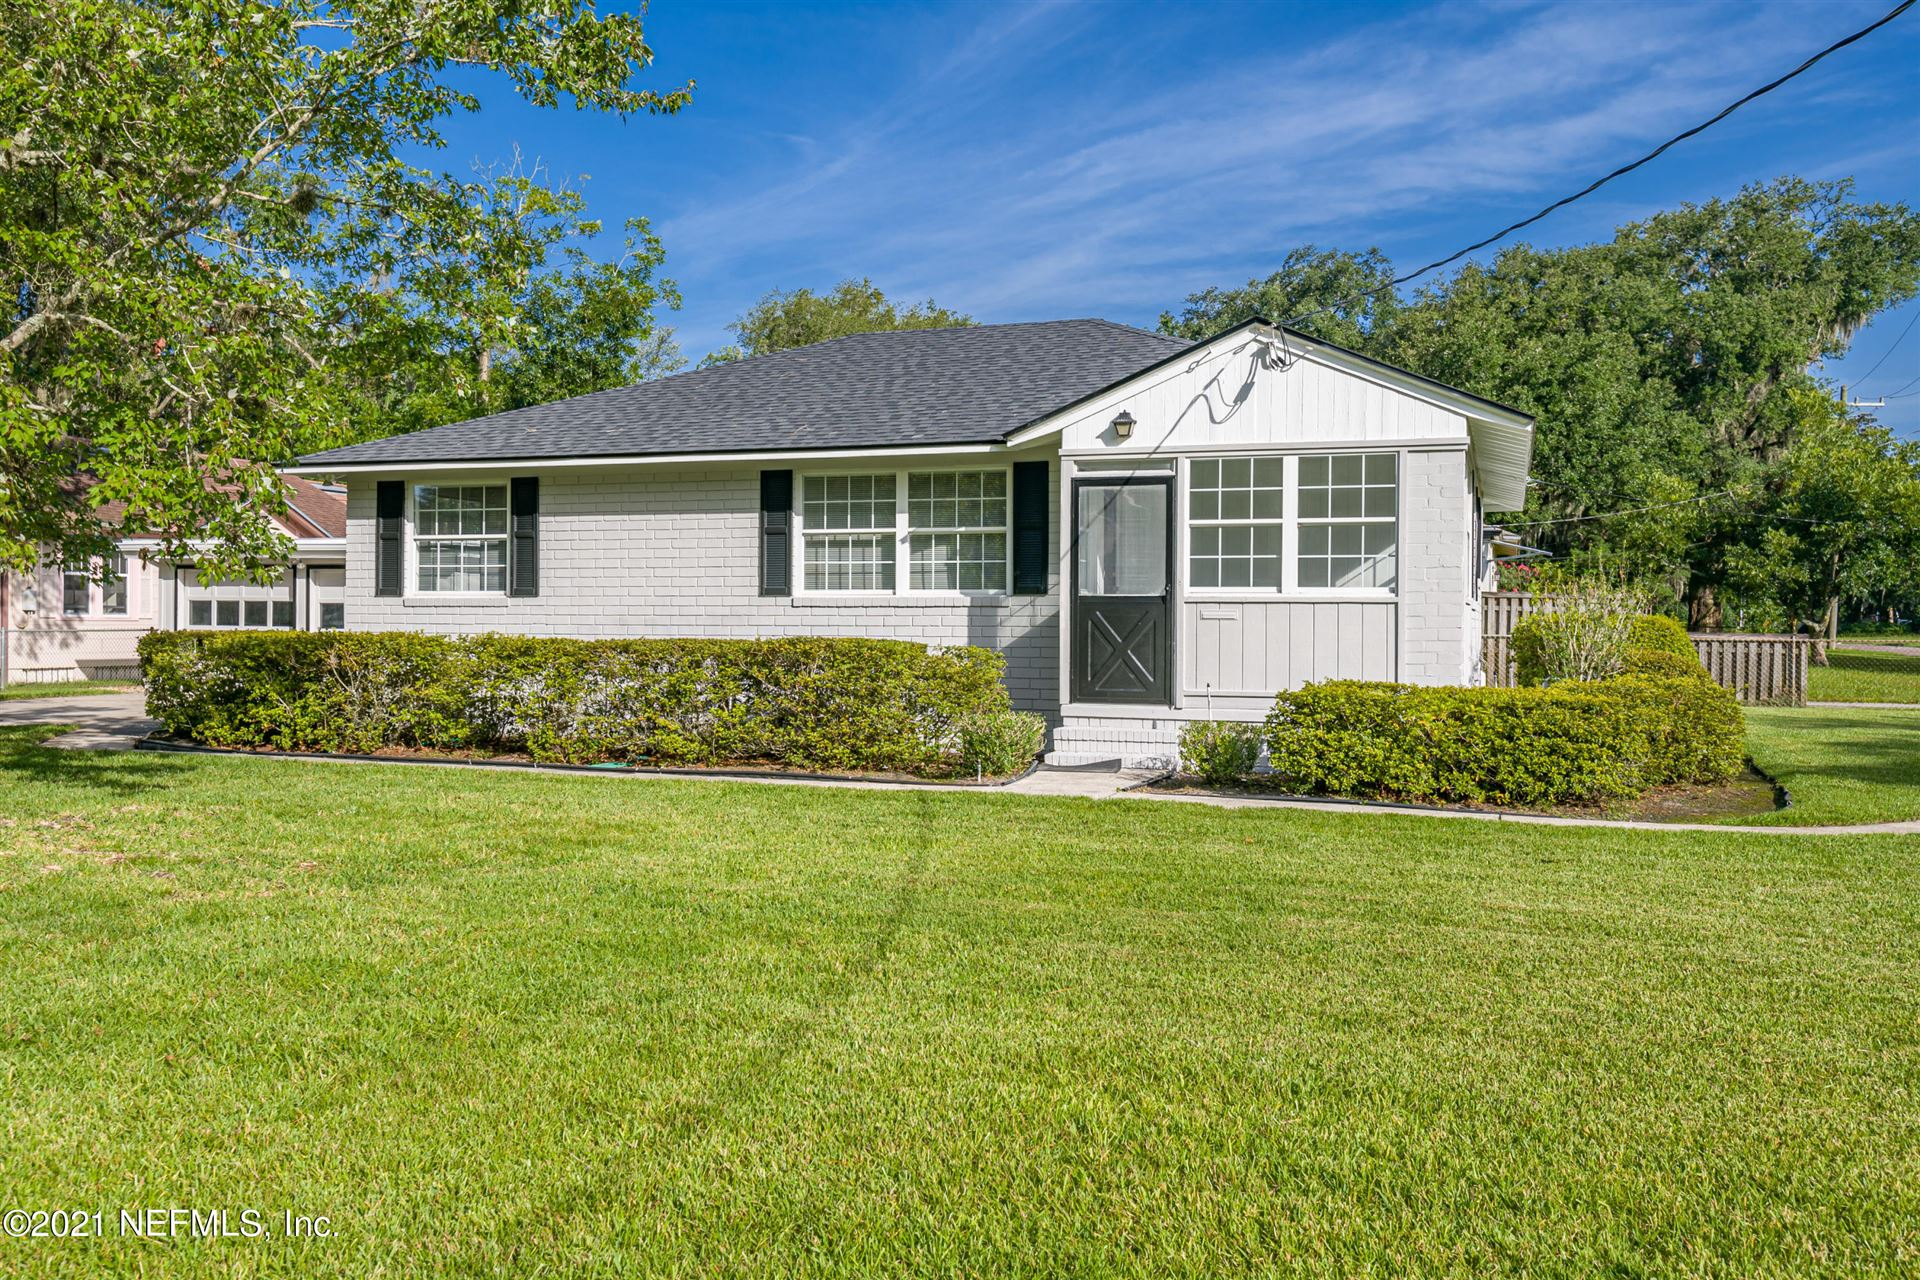 4404 VERONA AVE, Jacksonville, FL 32210 - MLS#: 1108366